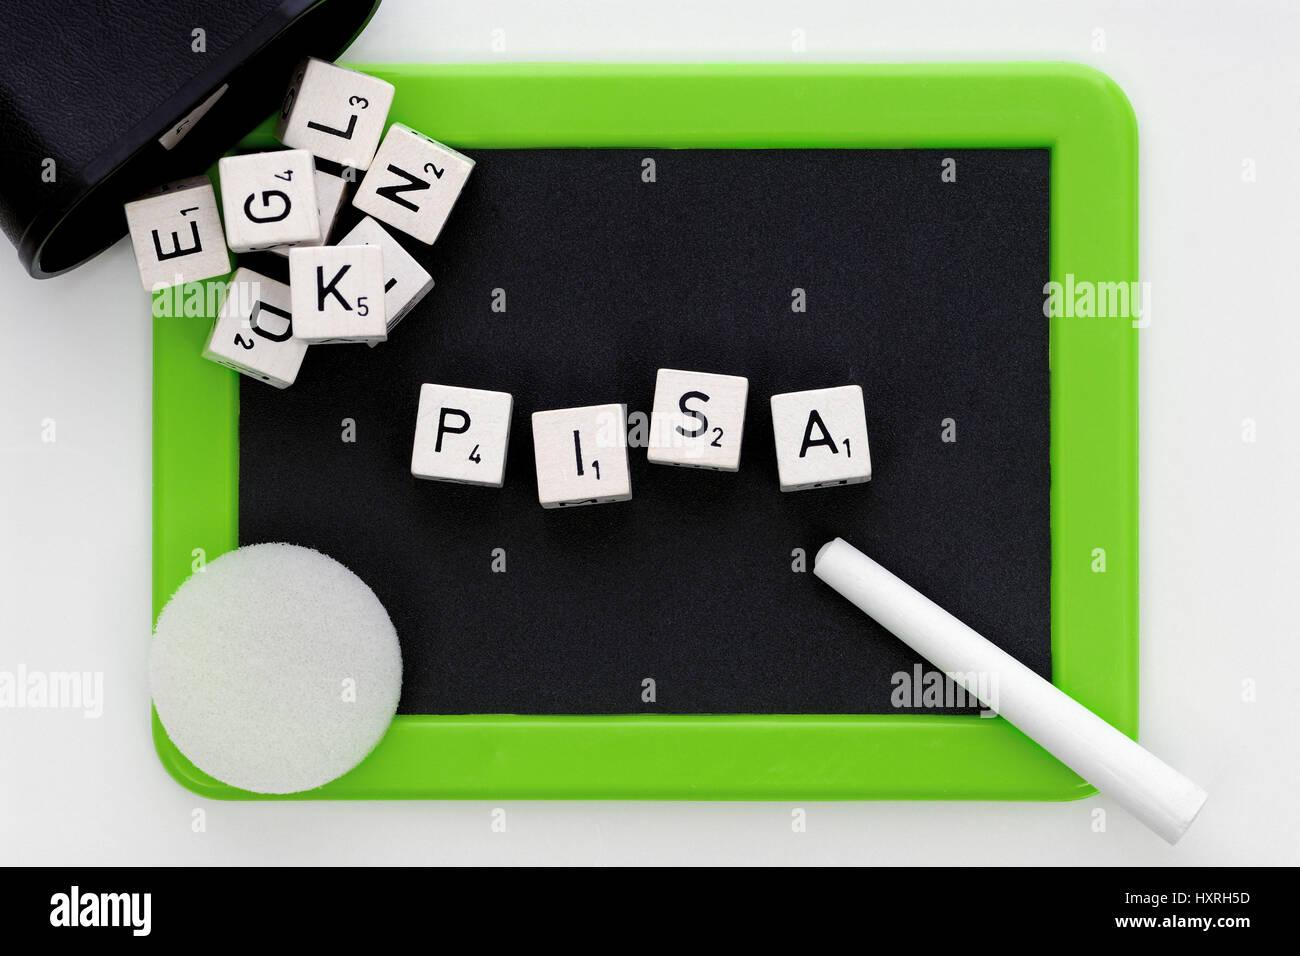 Pisa study, Pisa, study, studies, Germany, badly, education, educational plight, school, schools, bad, bad, stupidly, Stock Photo